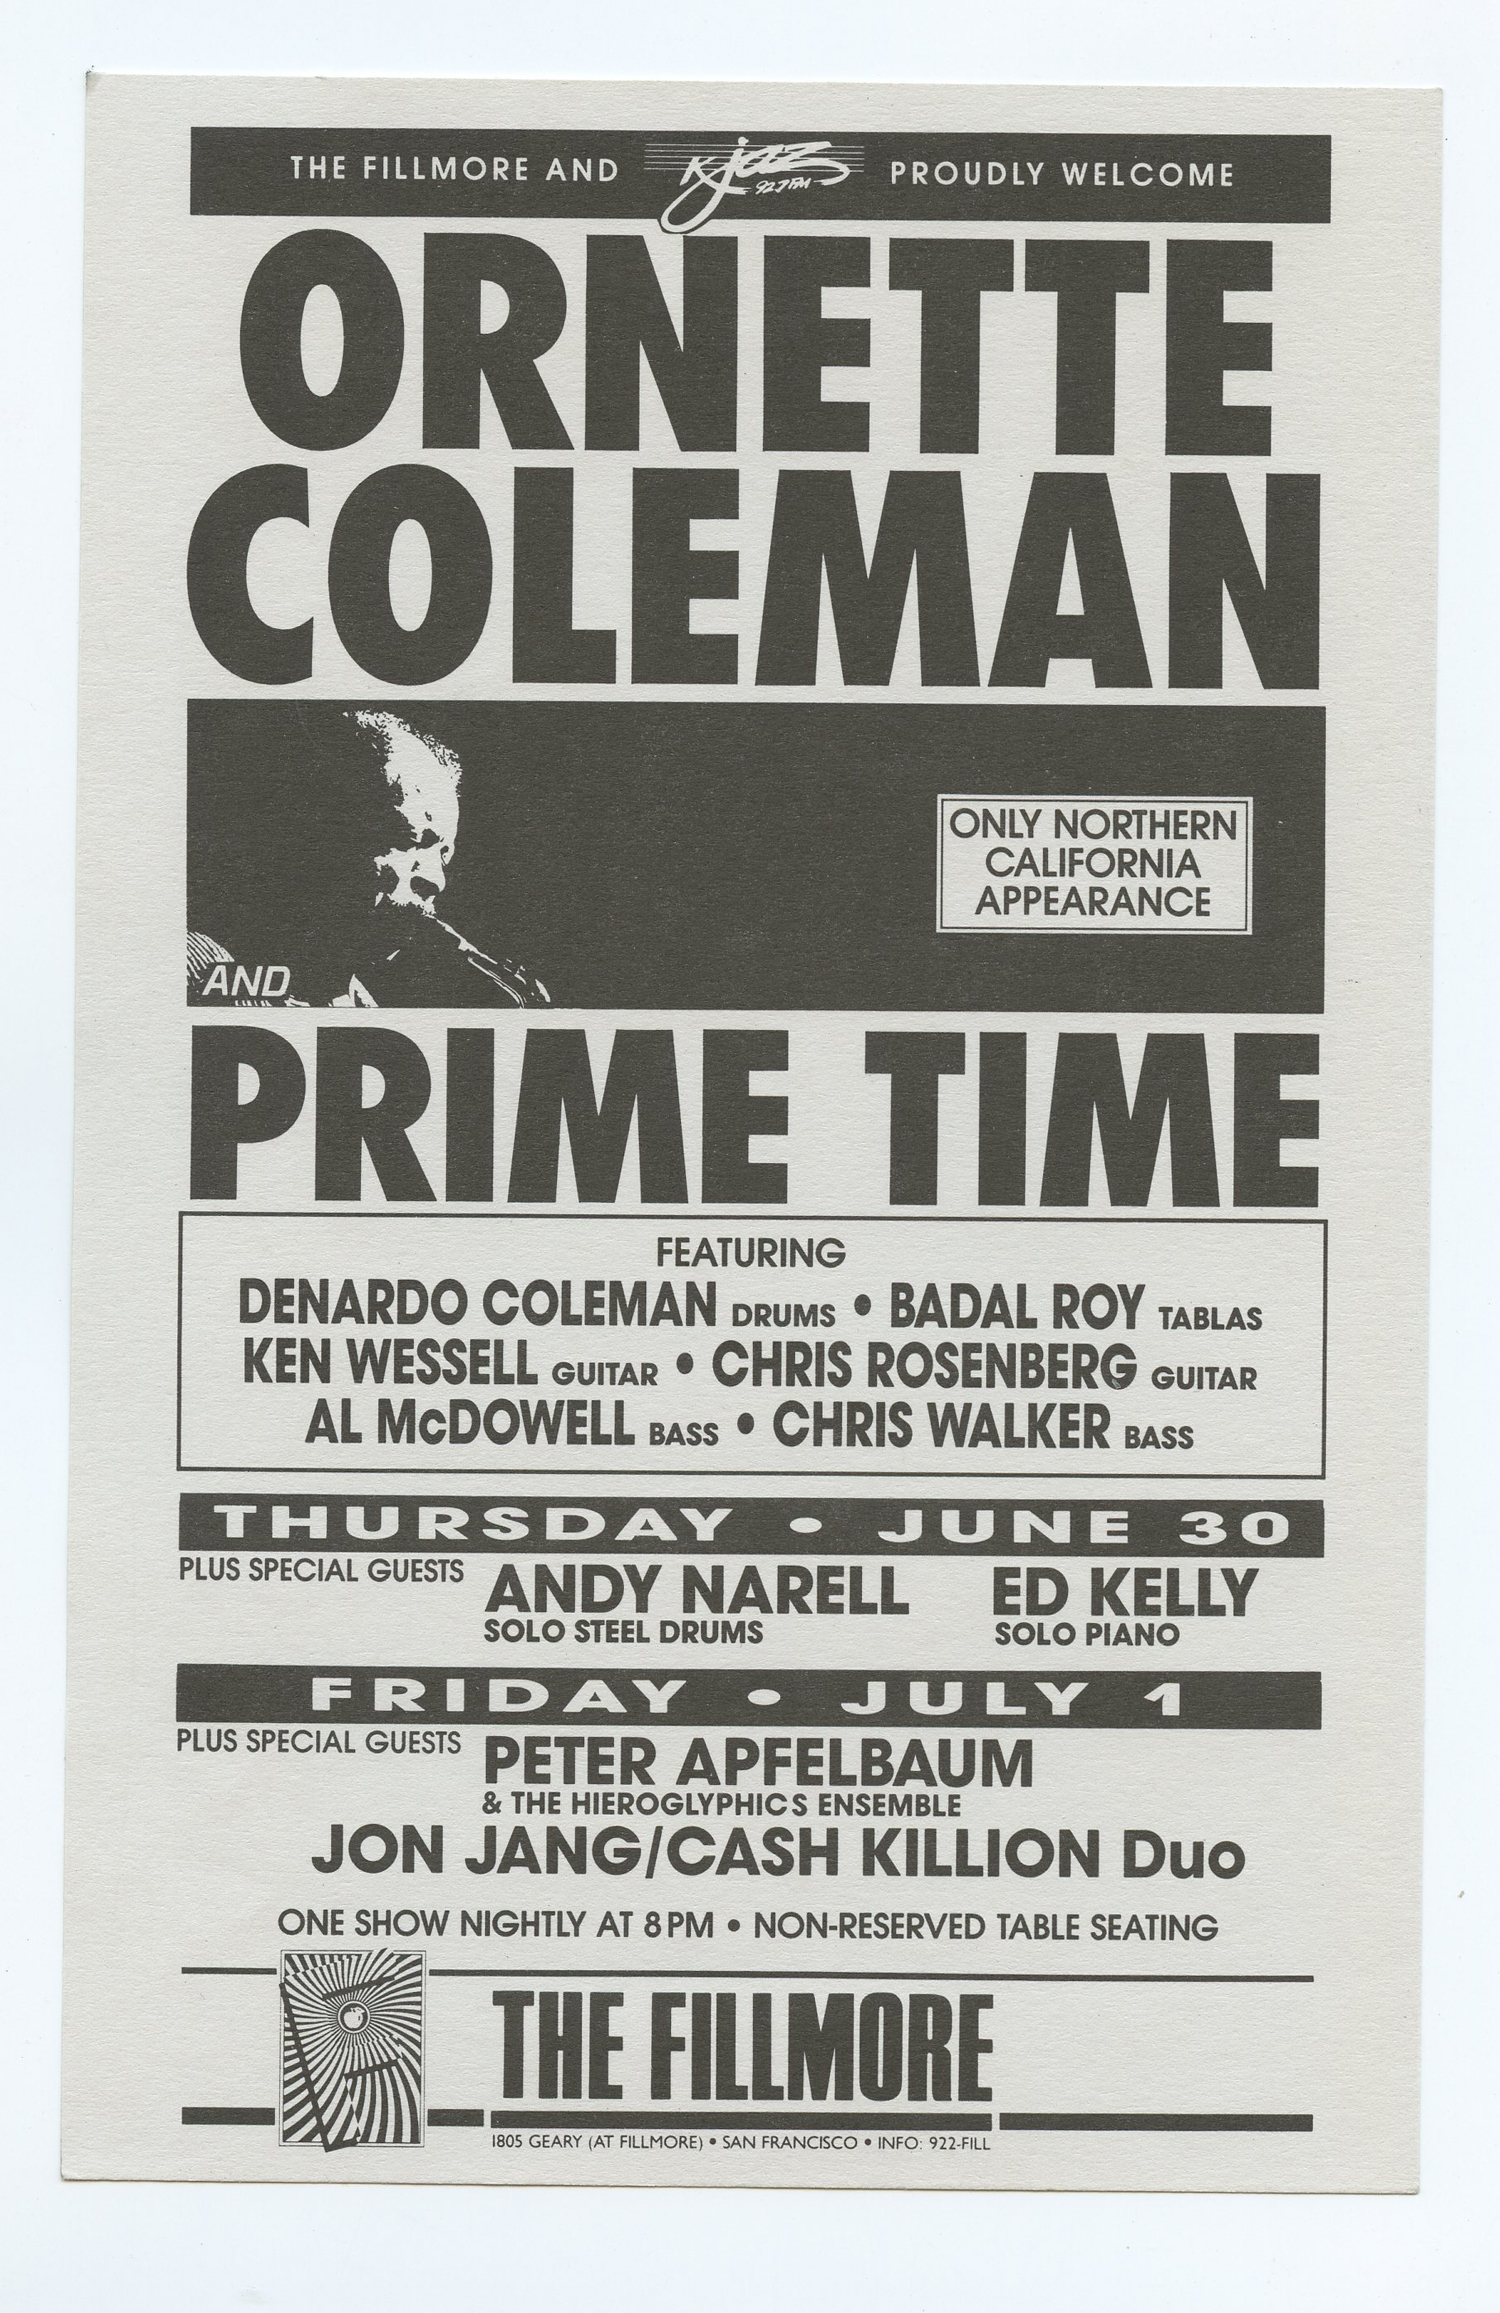 Ornette Coleman and Prime Time Handbill 1988 Jun 30 New Fillmore